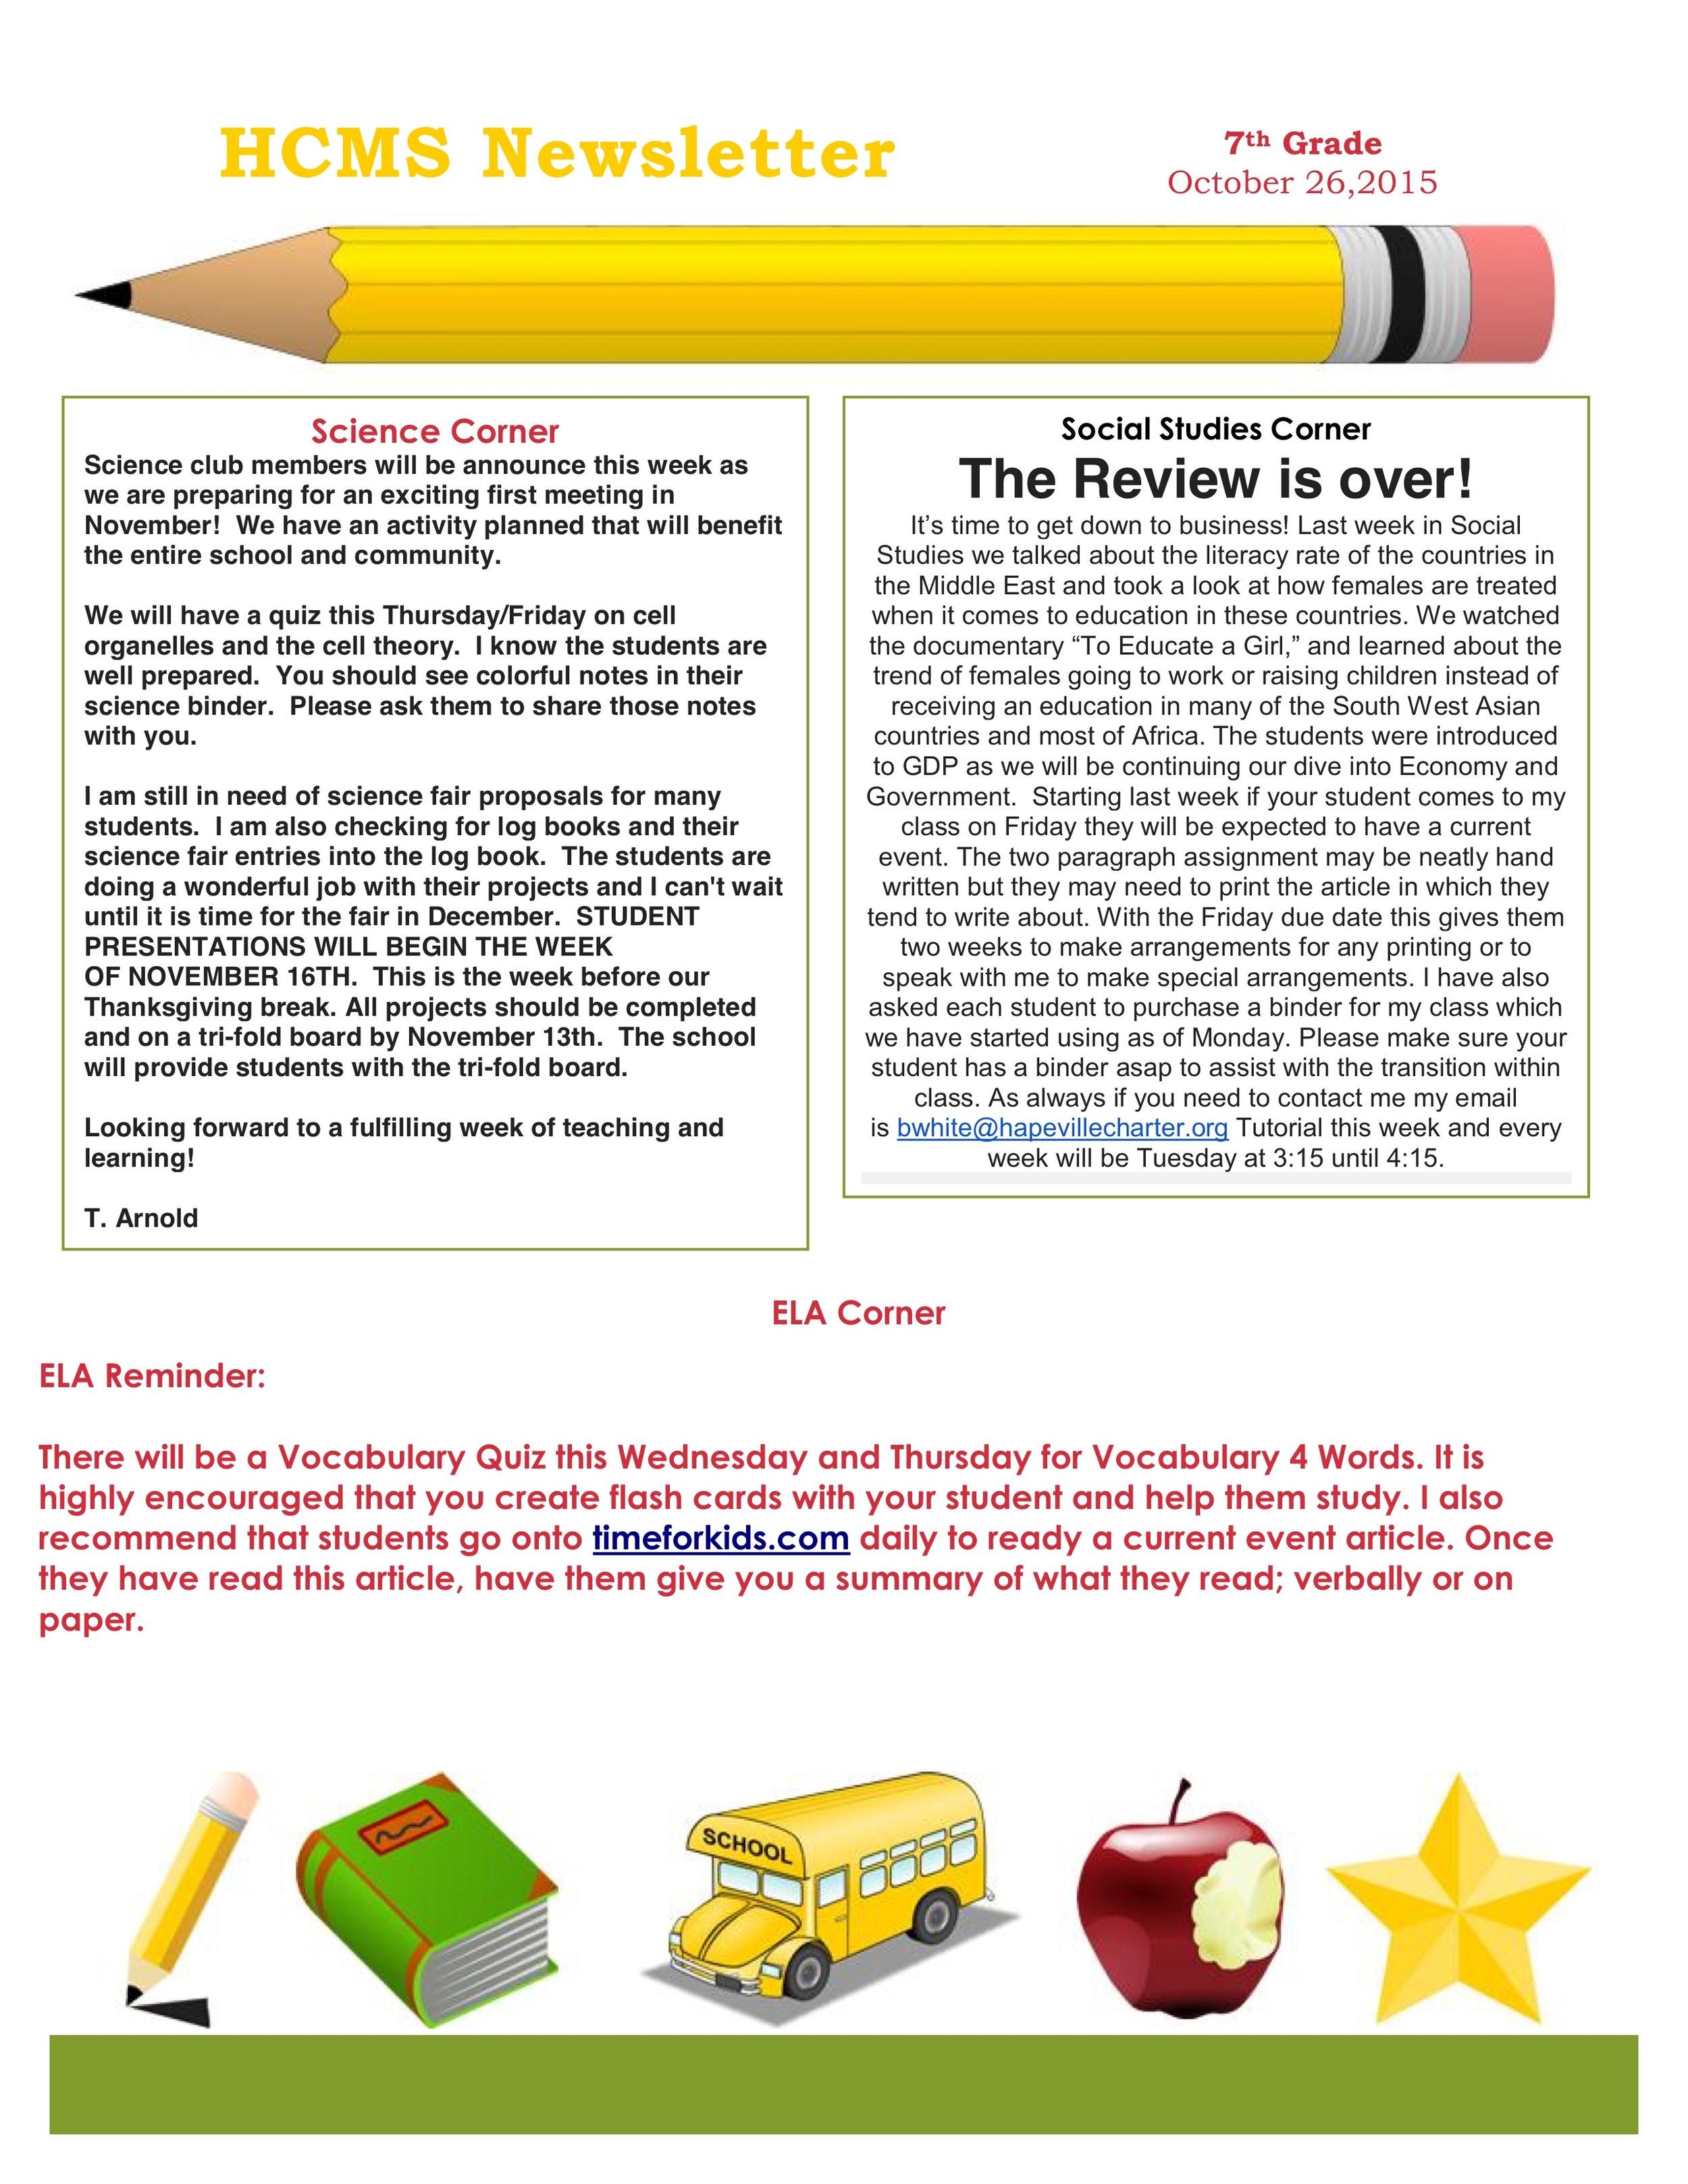 Newsletter Imagenewsletter for the week of the 26 of october.jpeg